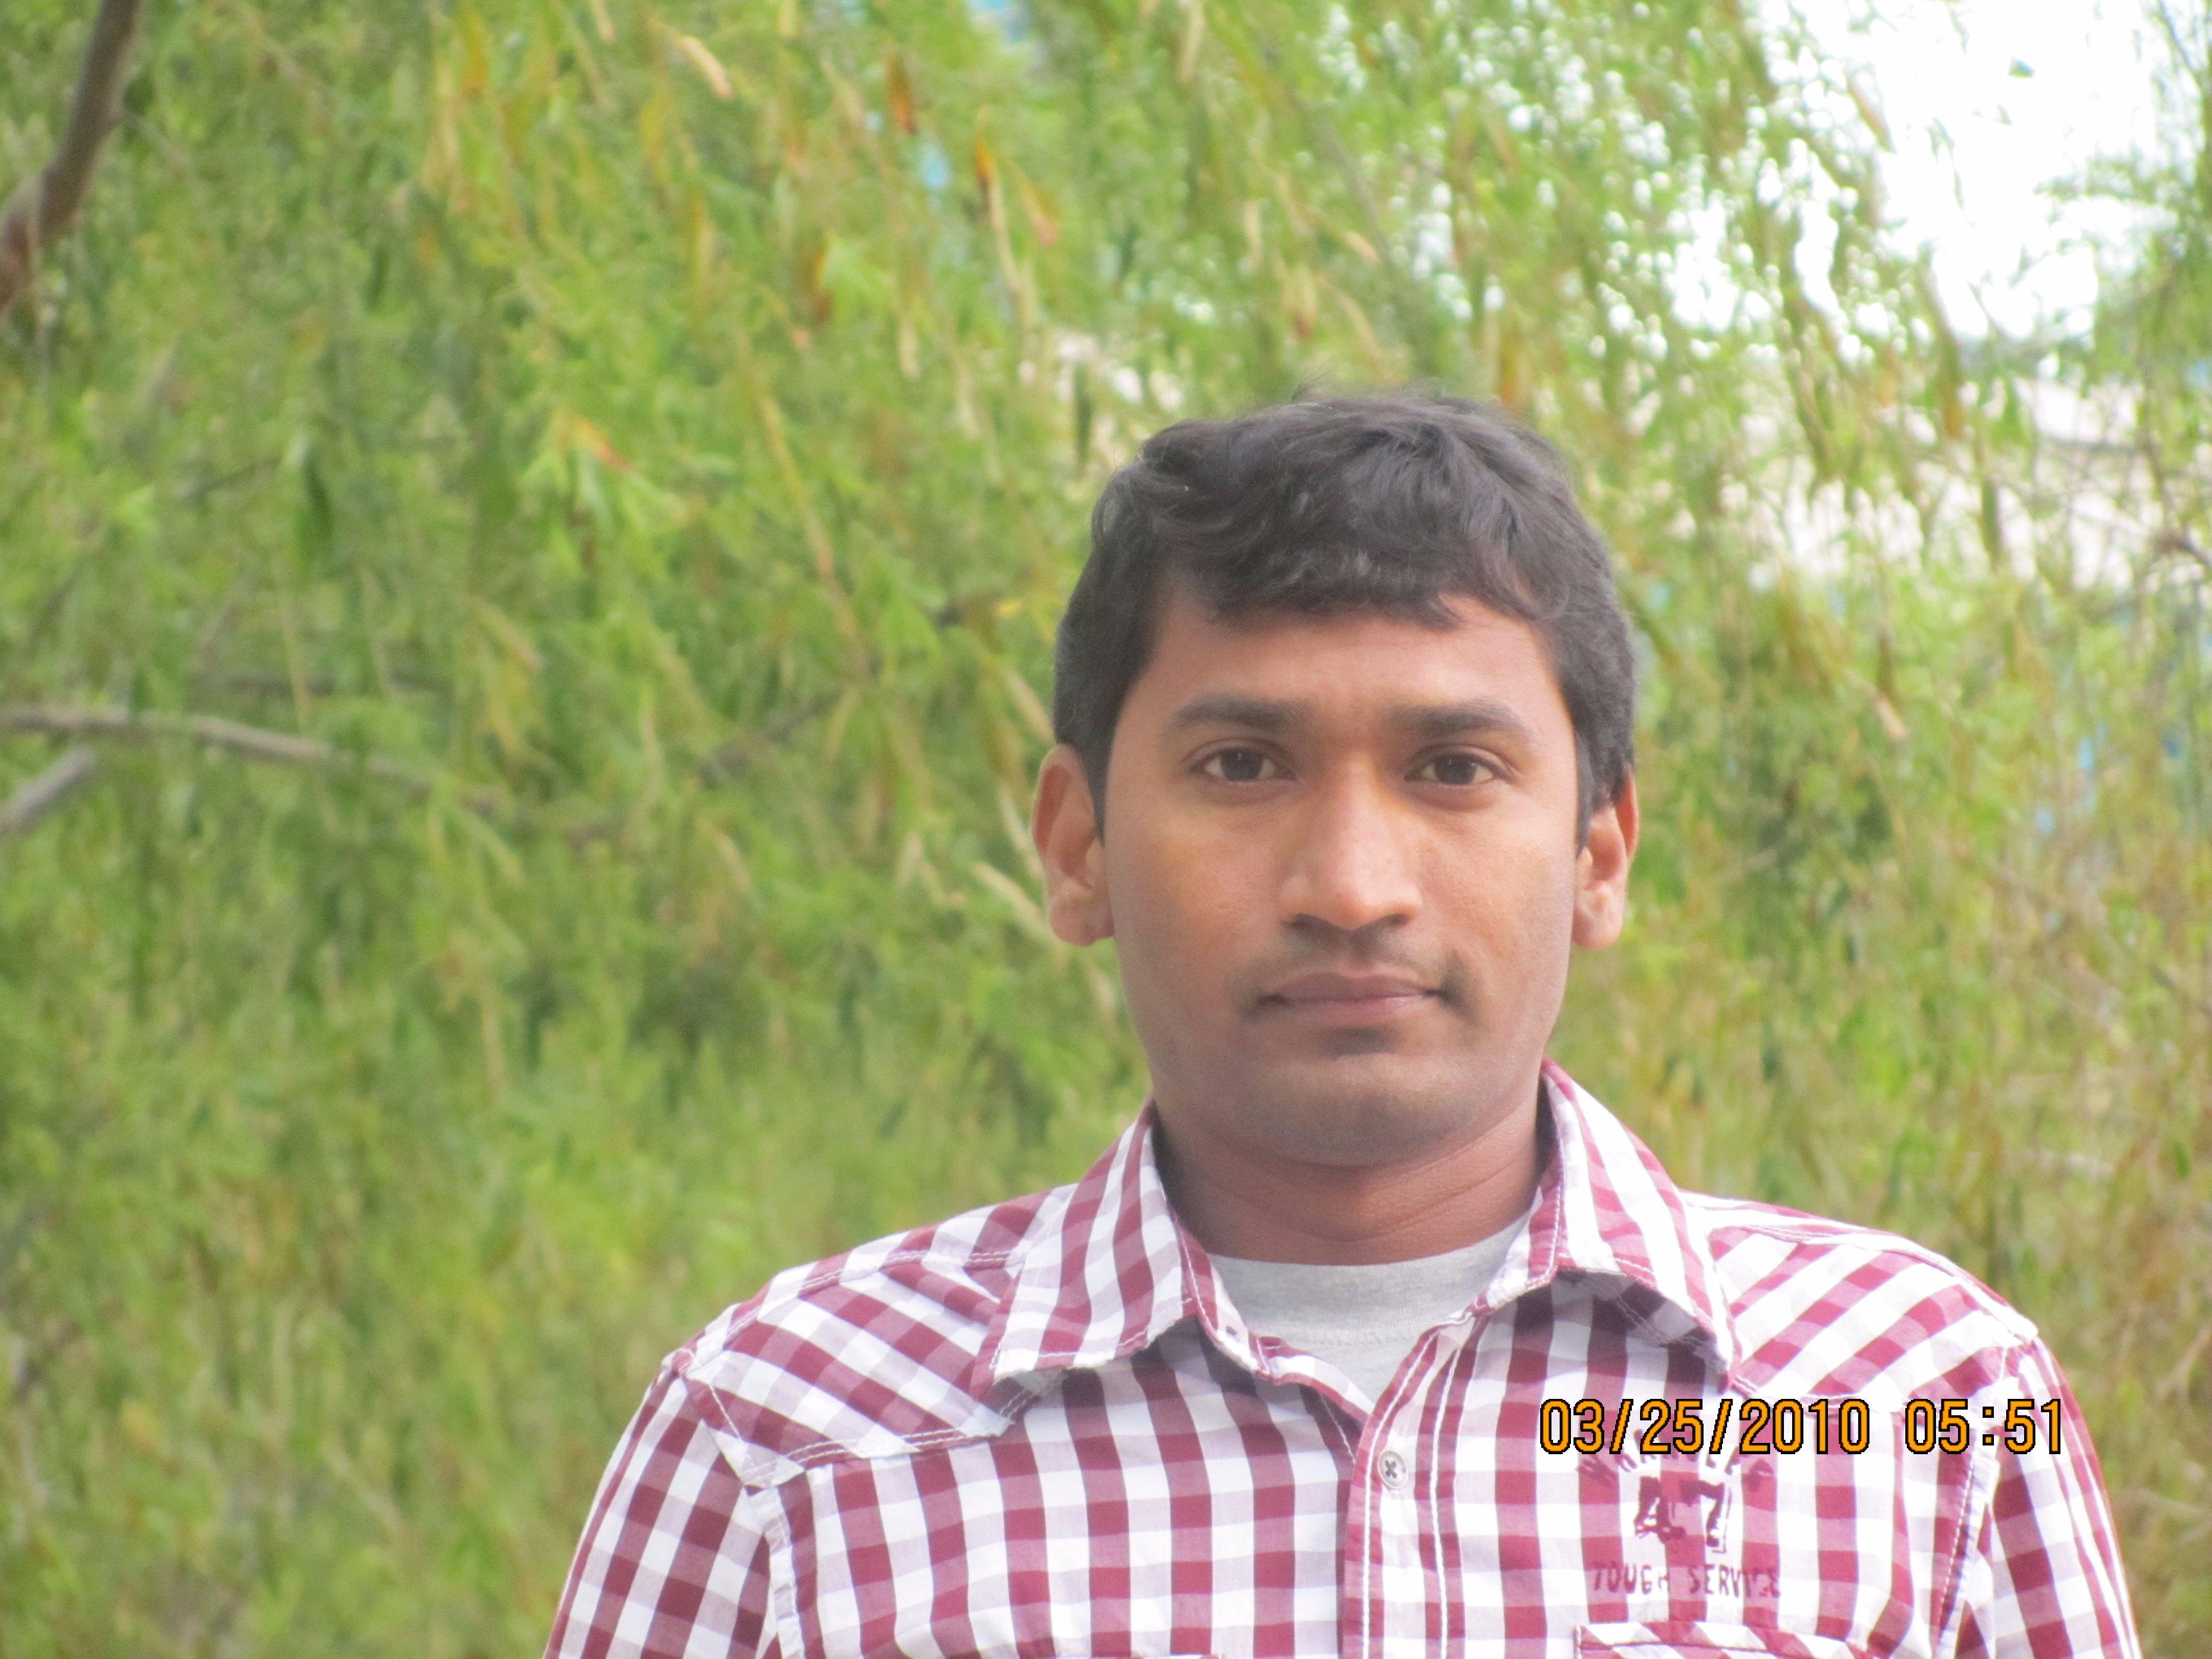 Database tuning mentor, Database tuning expert, Database tuning code help